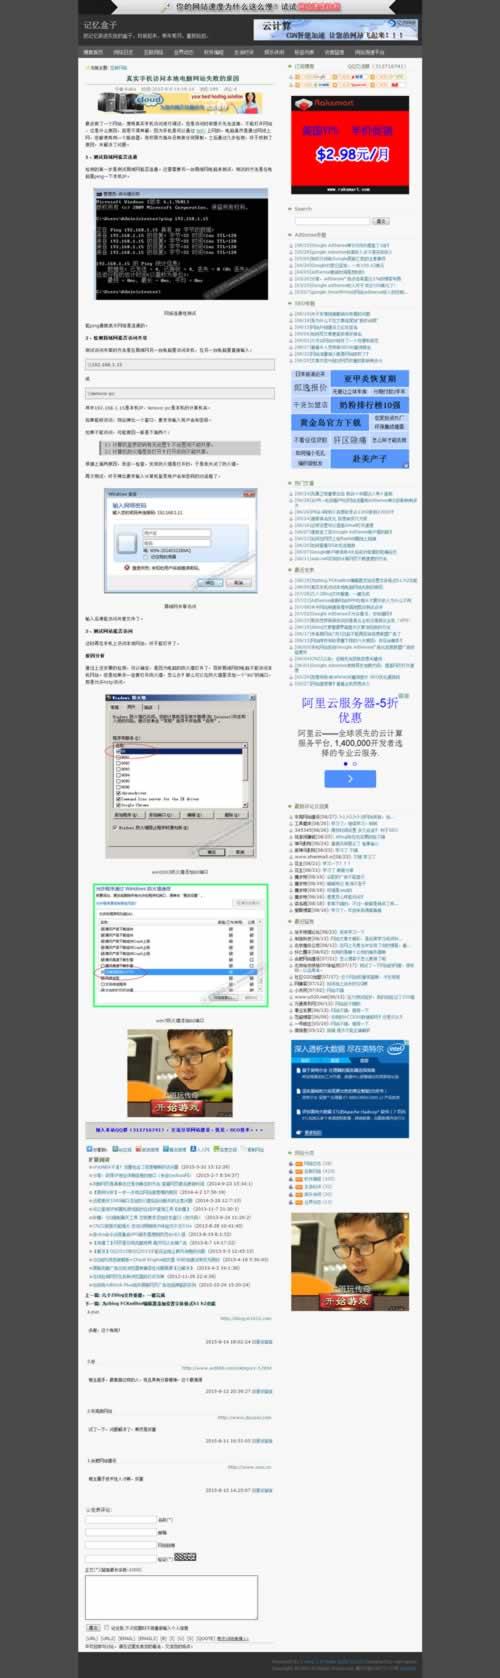 PC版网页